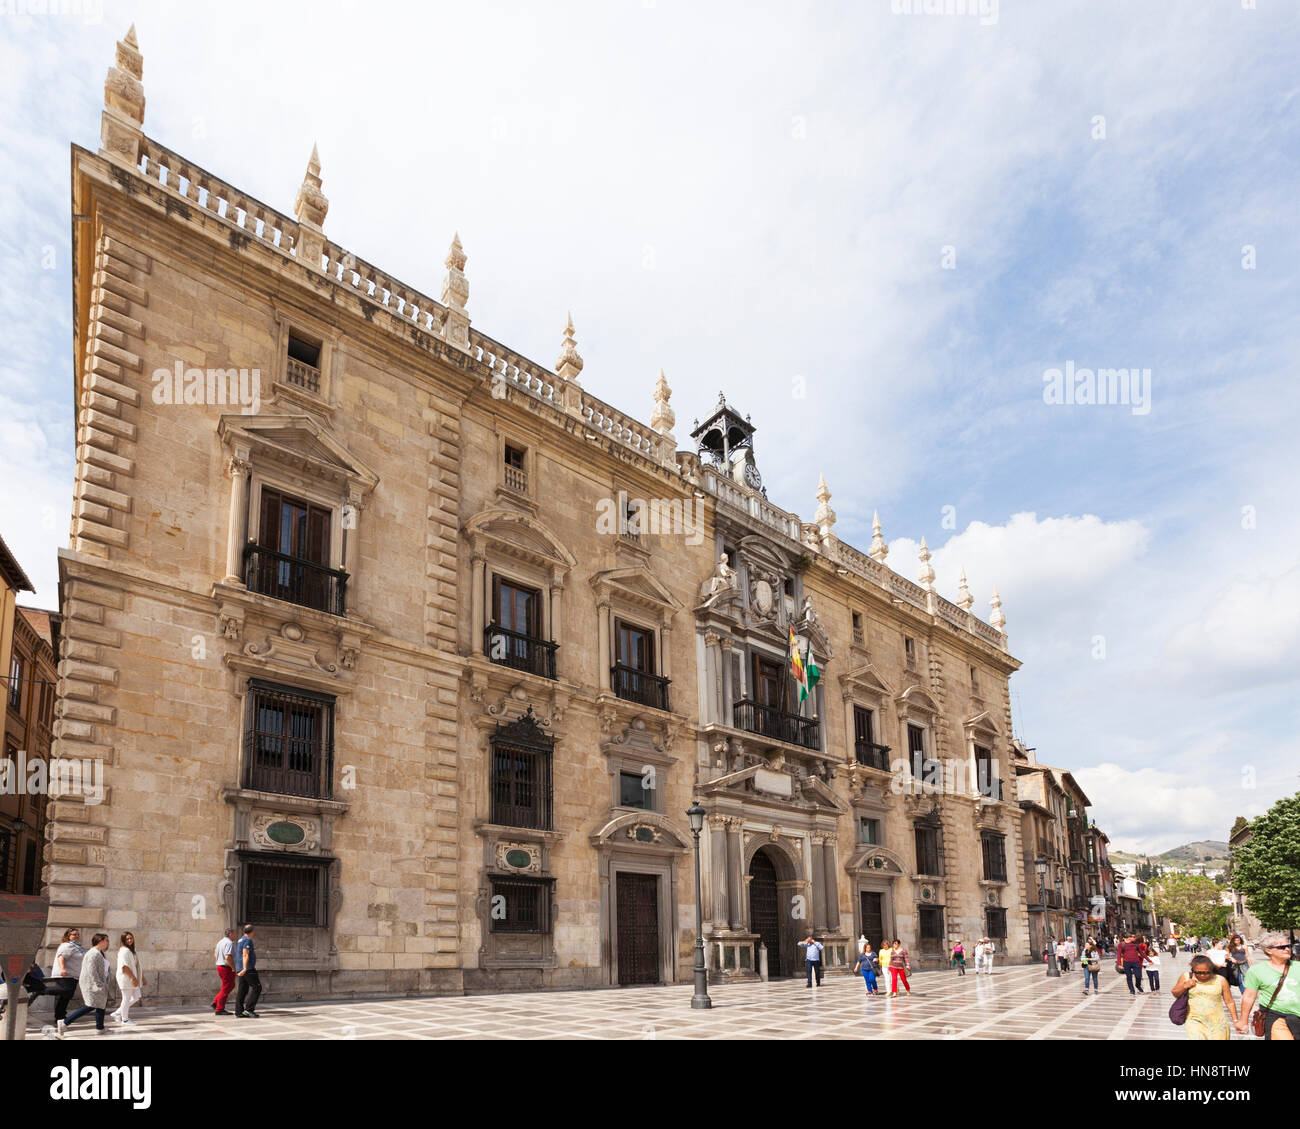 Granada, Spain - April 29, 2016: Palacio de la Chancilleria at Santa Ana square, seat of the royal chancery from - Stock Image